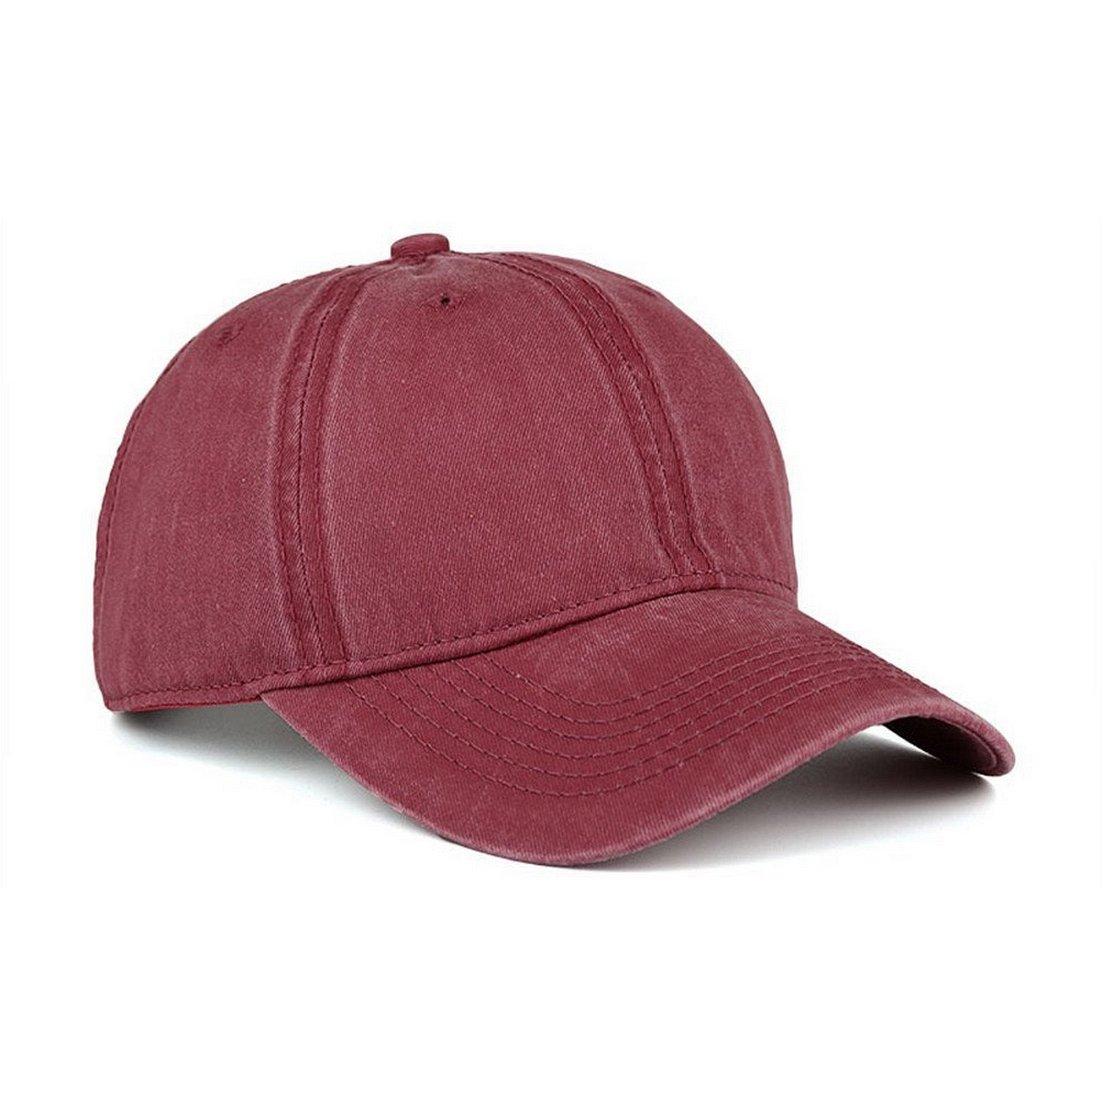 VANCIC Low Profile Washed Brushed Twill Cotton Adjustable Baseball Cap Dad Hat